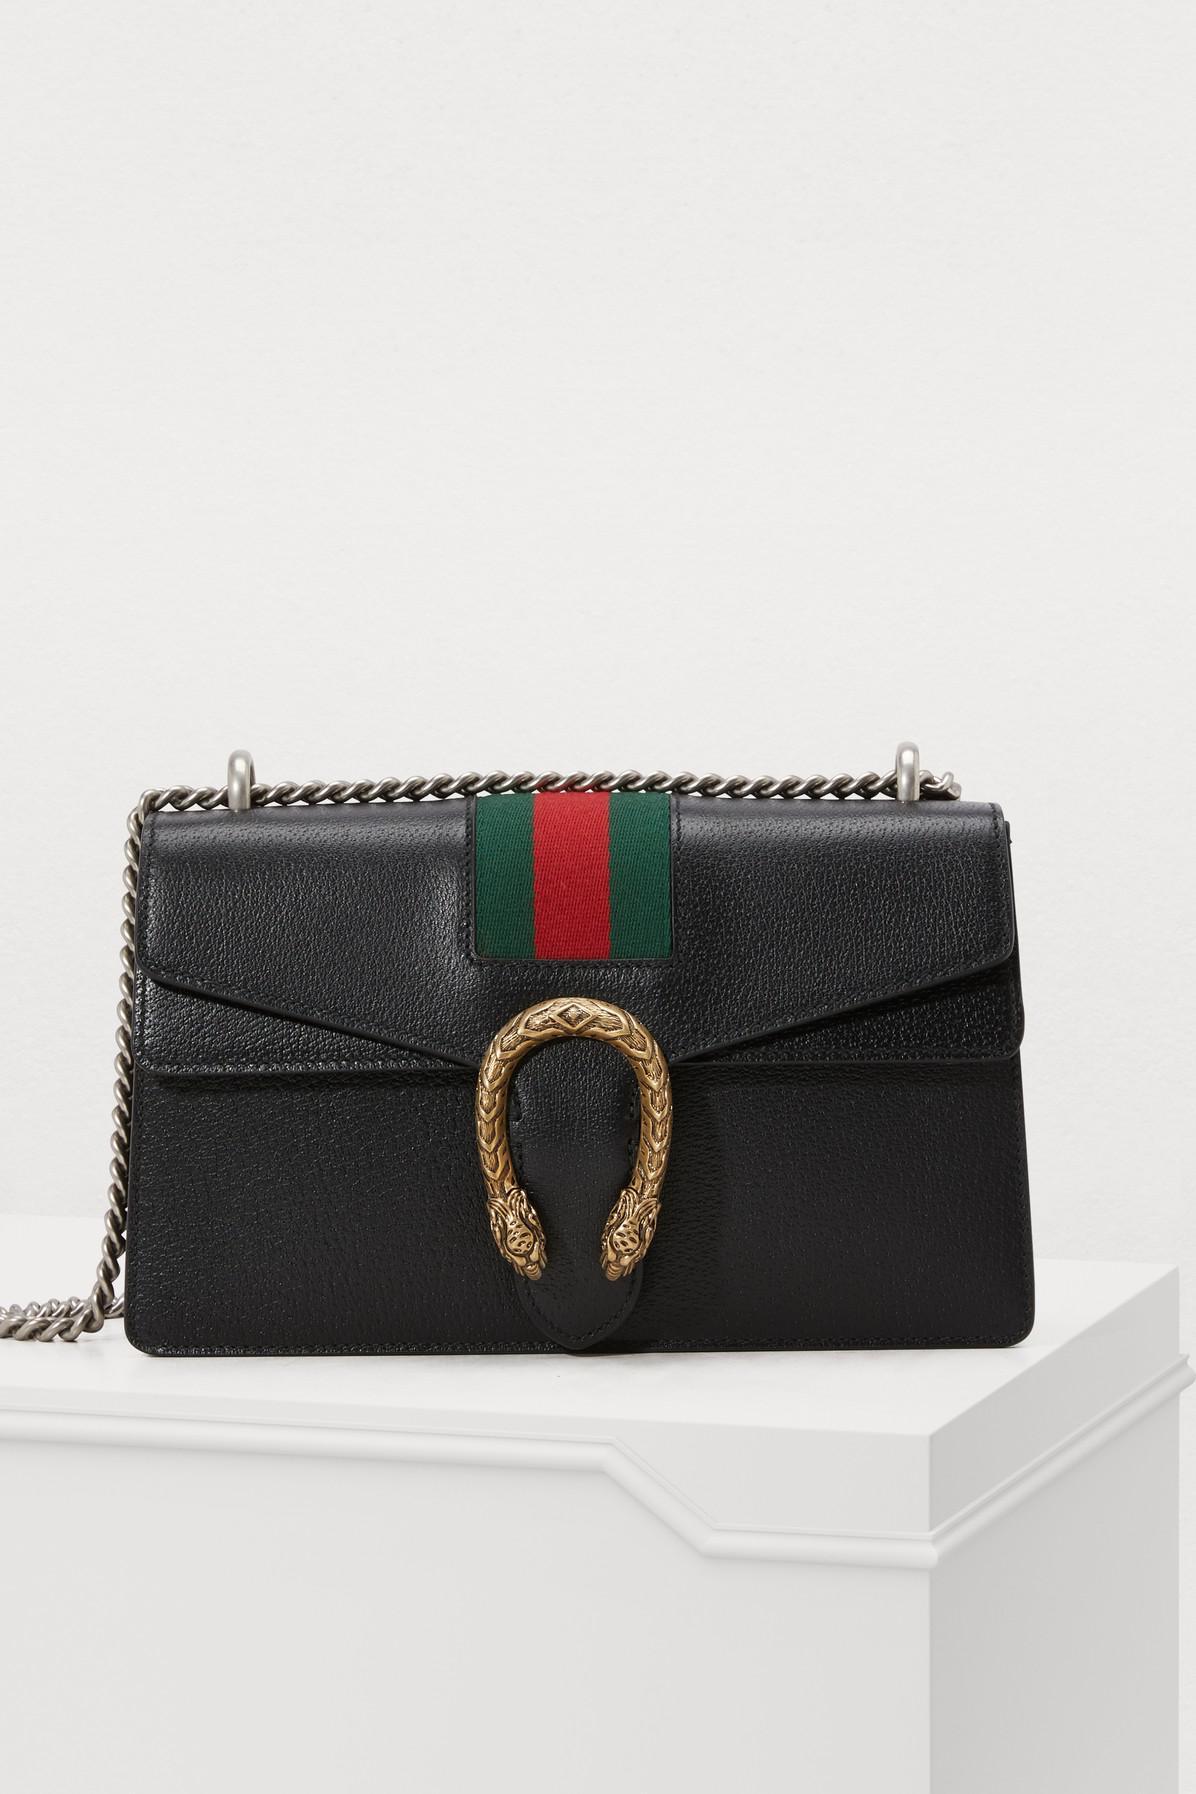 dab79648a83 Gucci Dionysus Leather Shoulder Bag in Black - Save 52% - Lyst